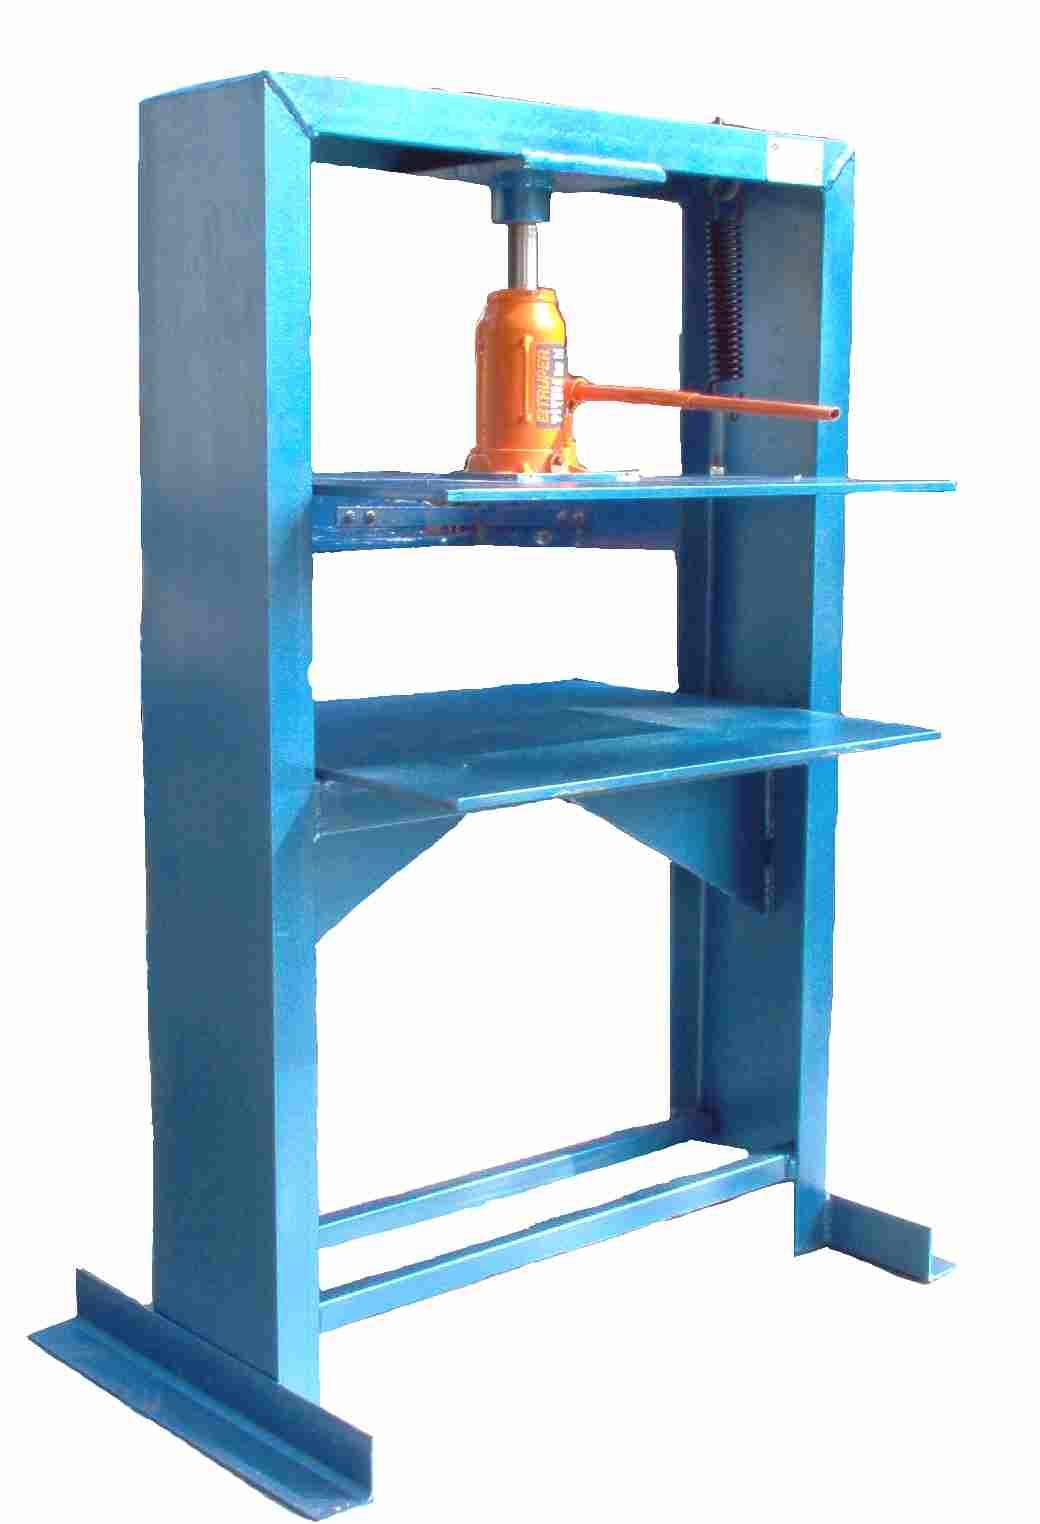 Prensa Hidraulica Manual para Elaborar Papel Artesanal Papel  #0C90BF 1040 1524